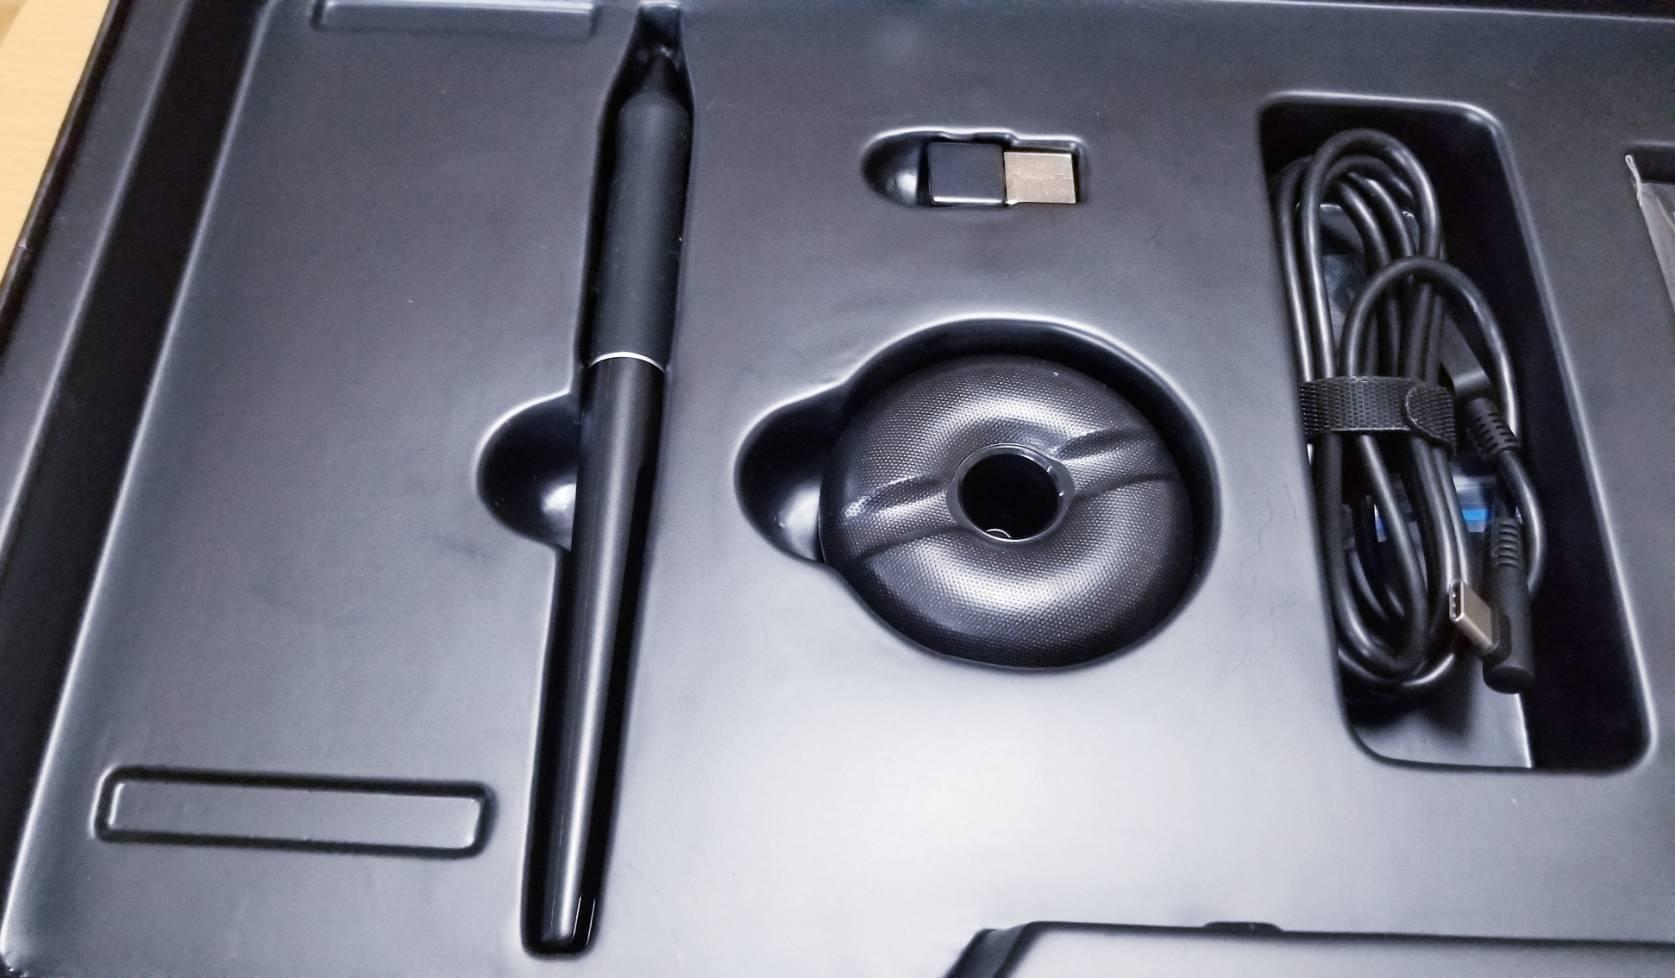 HUION KD200付属品ペン・ペン立て